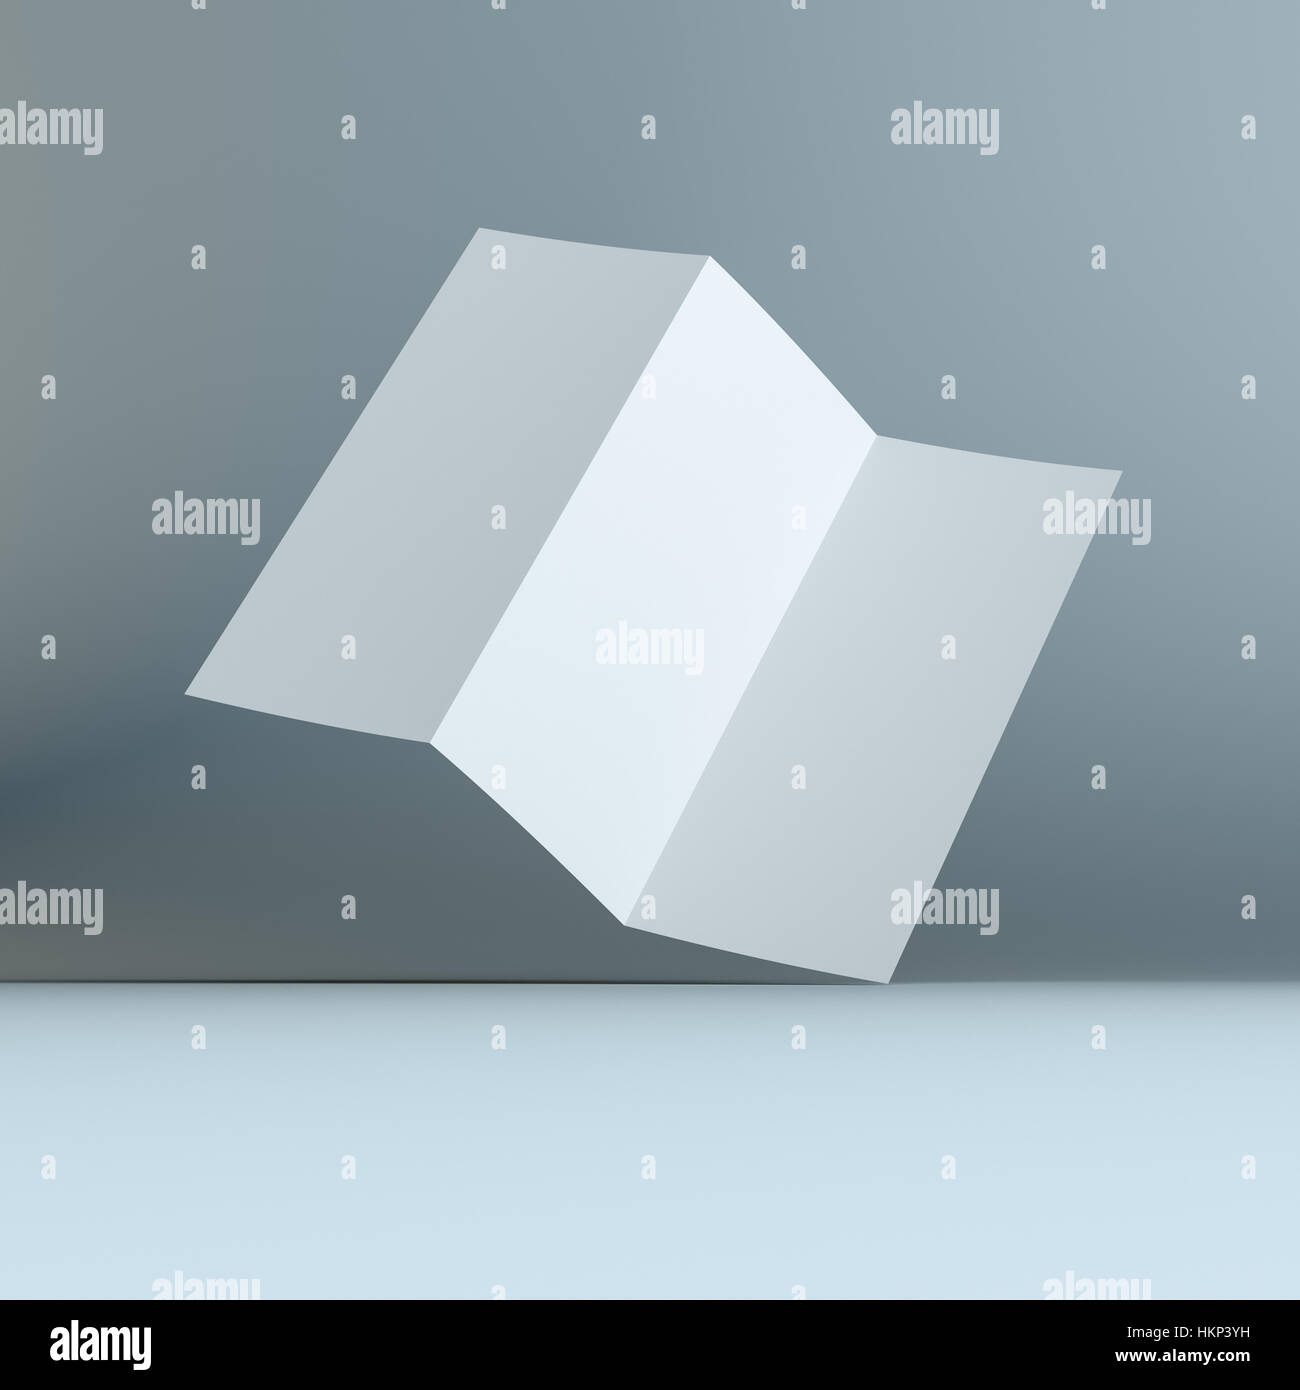 simple blank tri fold brochure corporate identity stock photo